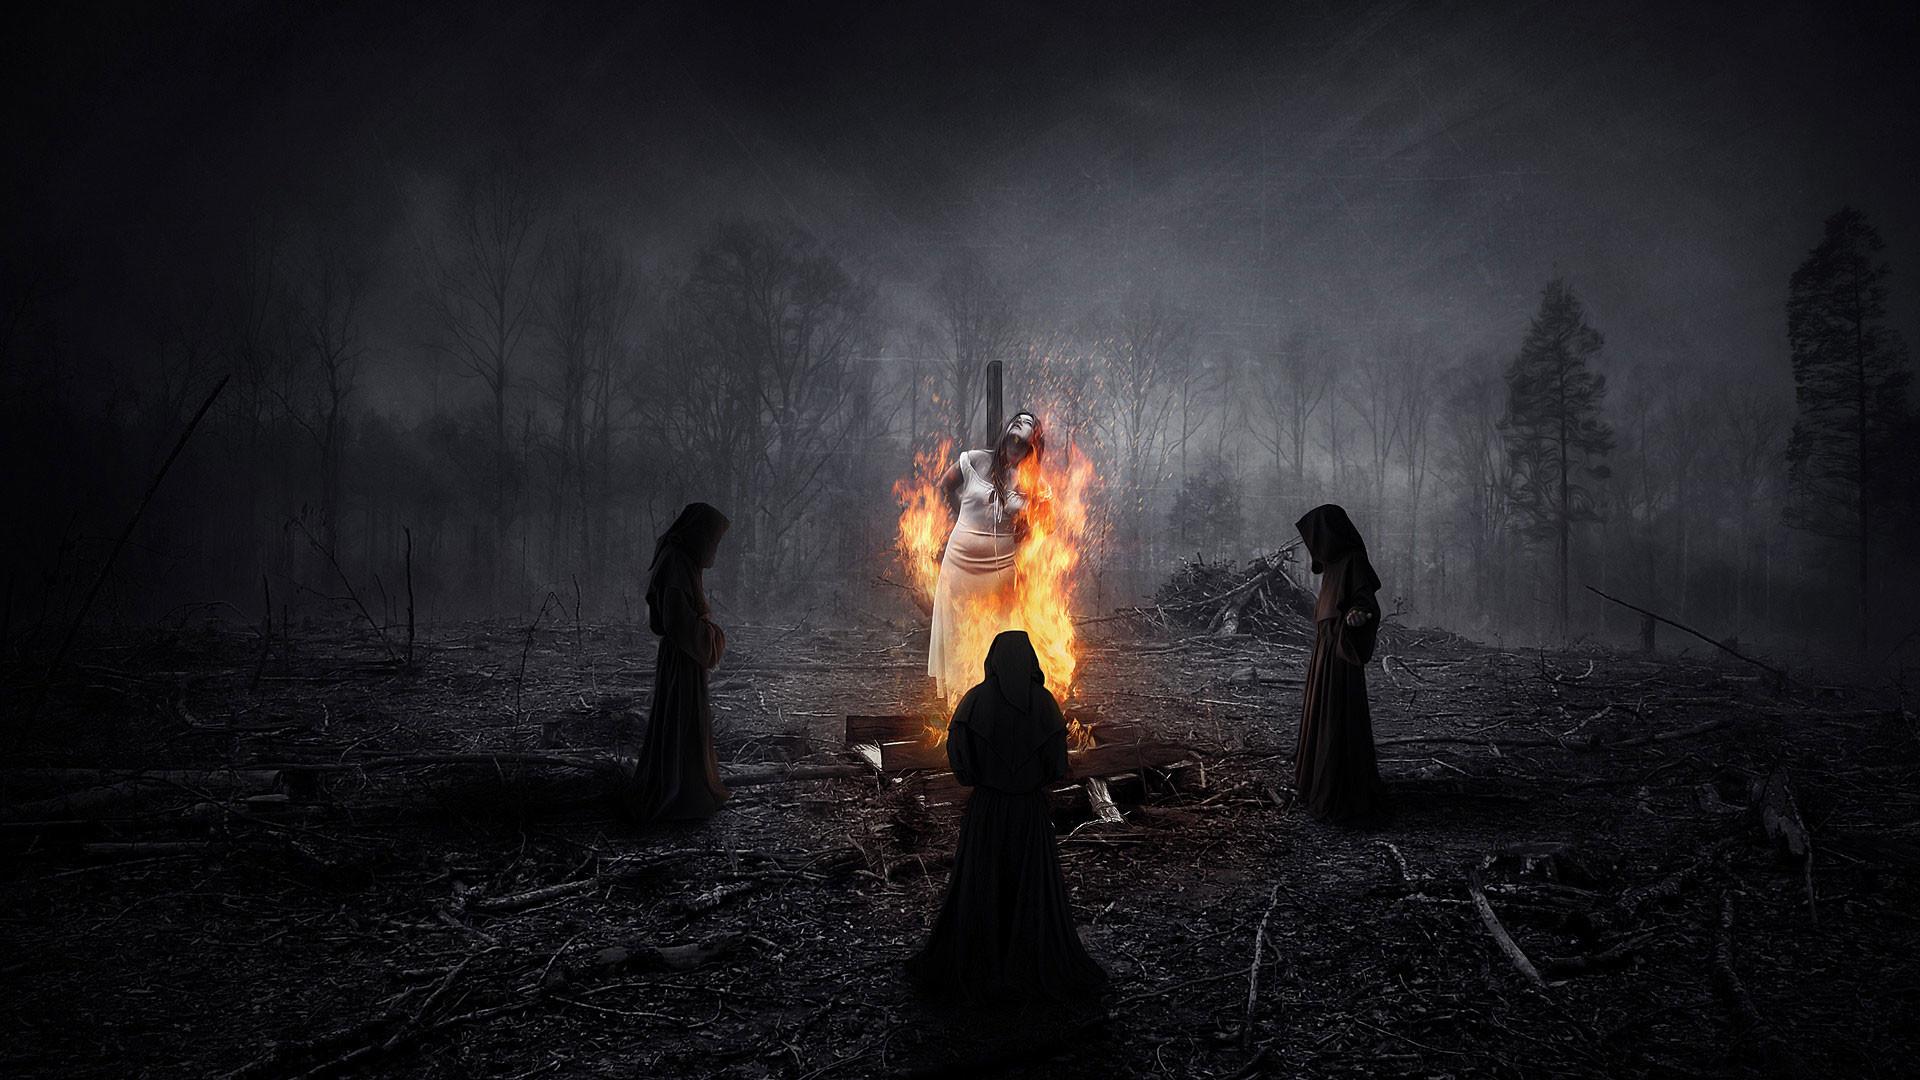 hd pics photos best christian night horror fire myth satan girl fantasy  witch hd quality desktop